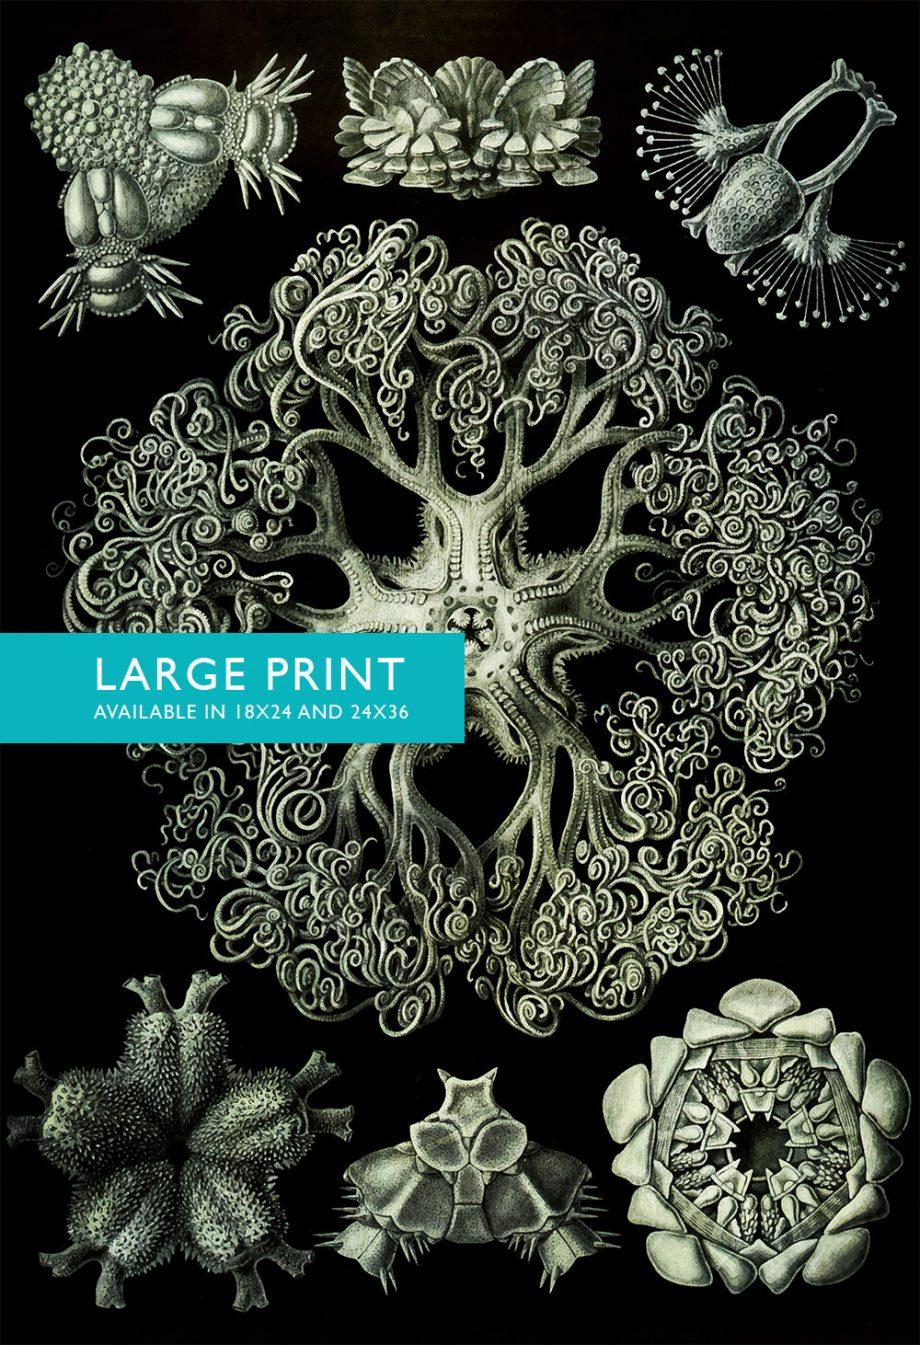 Ernst Haeckel Ophiodea Print Marine Invertebrate Art Vintage Nautical Decor Ocean Wall Art - Giclee Print on Canvas & Satin